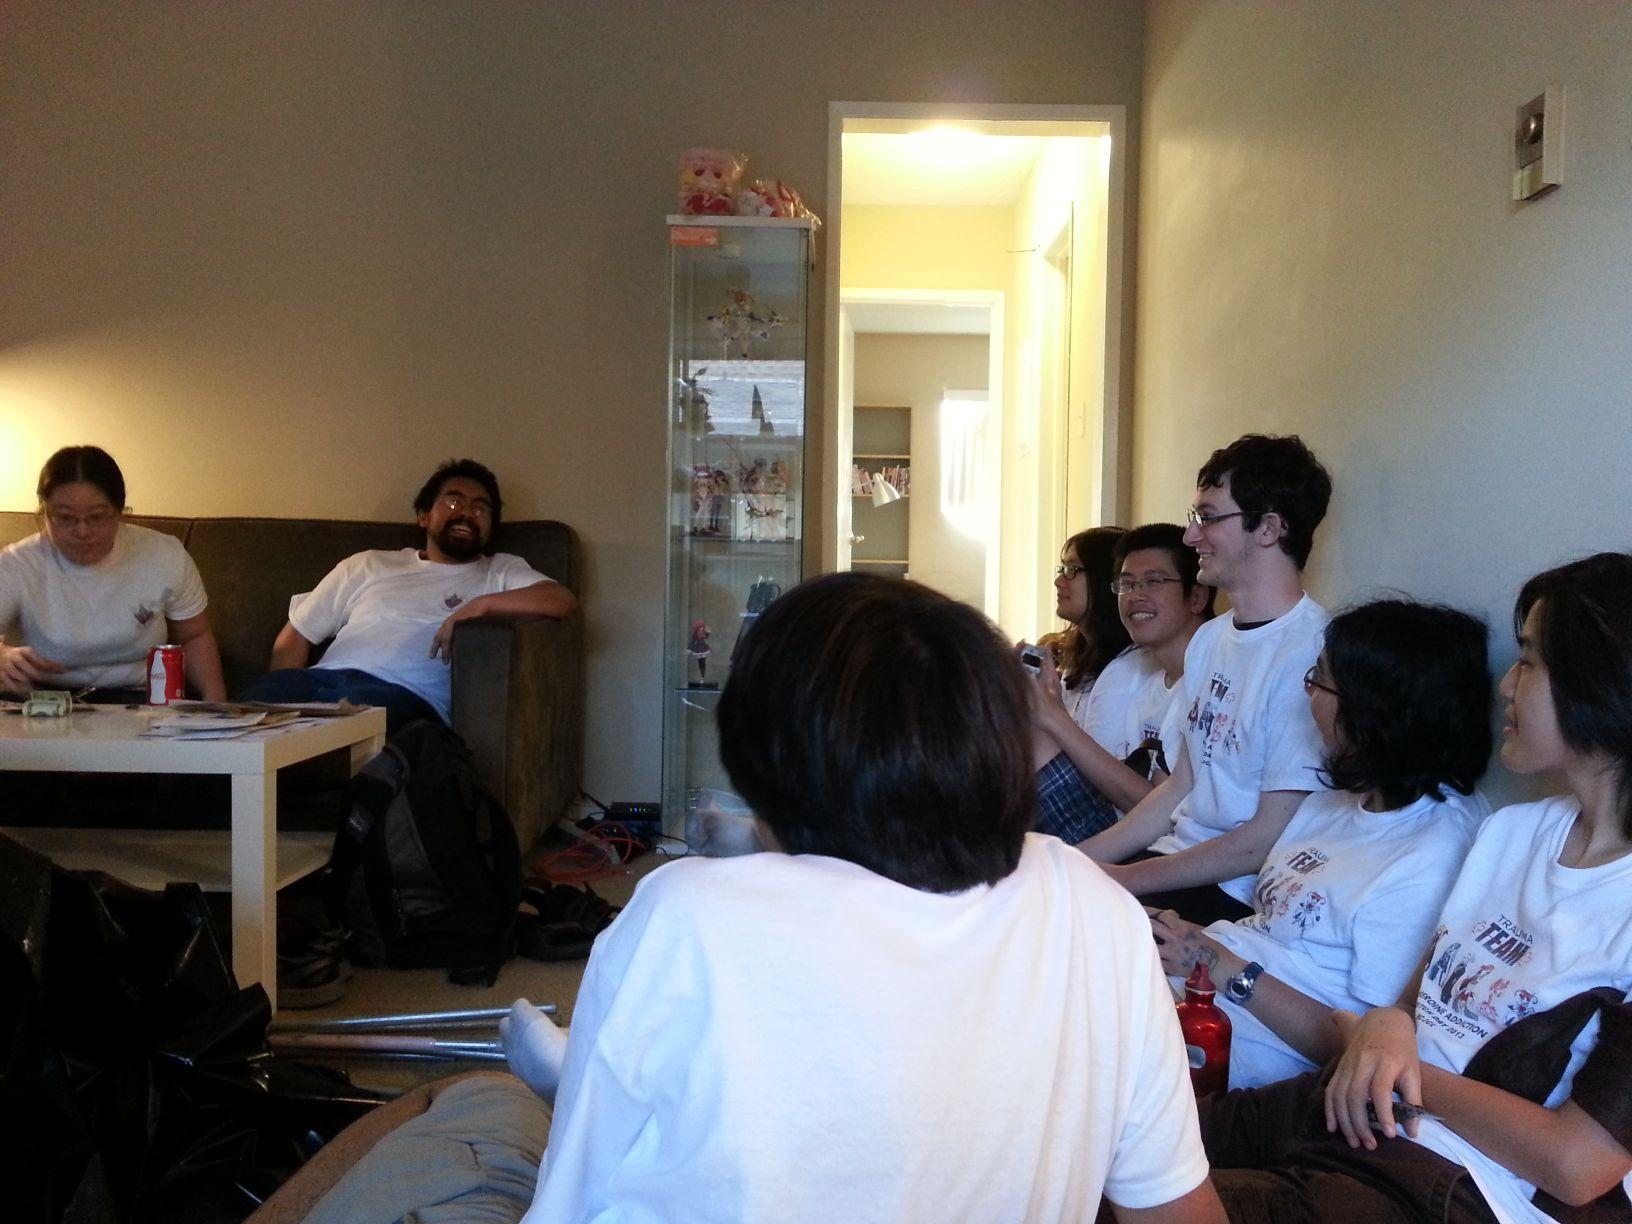 Finally, we chill in Raymond and Jomya's apartment...